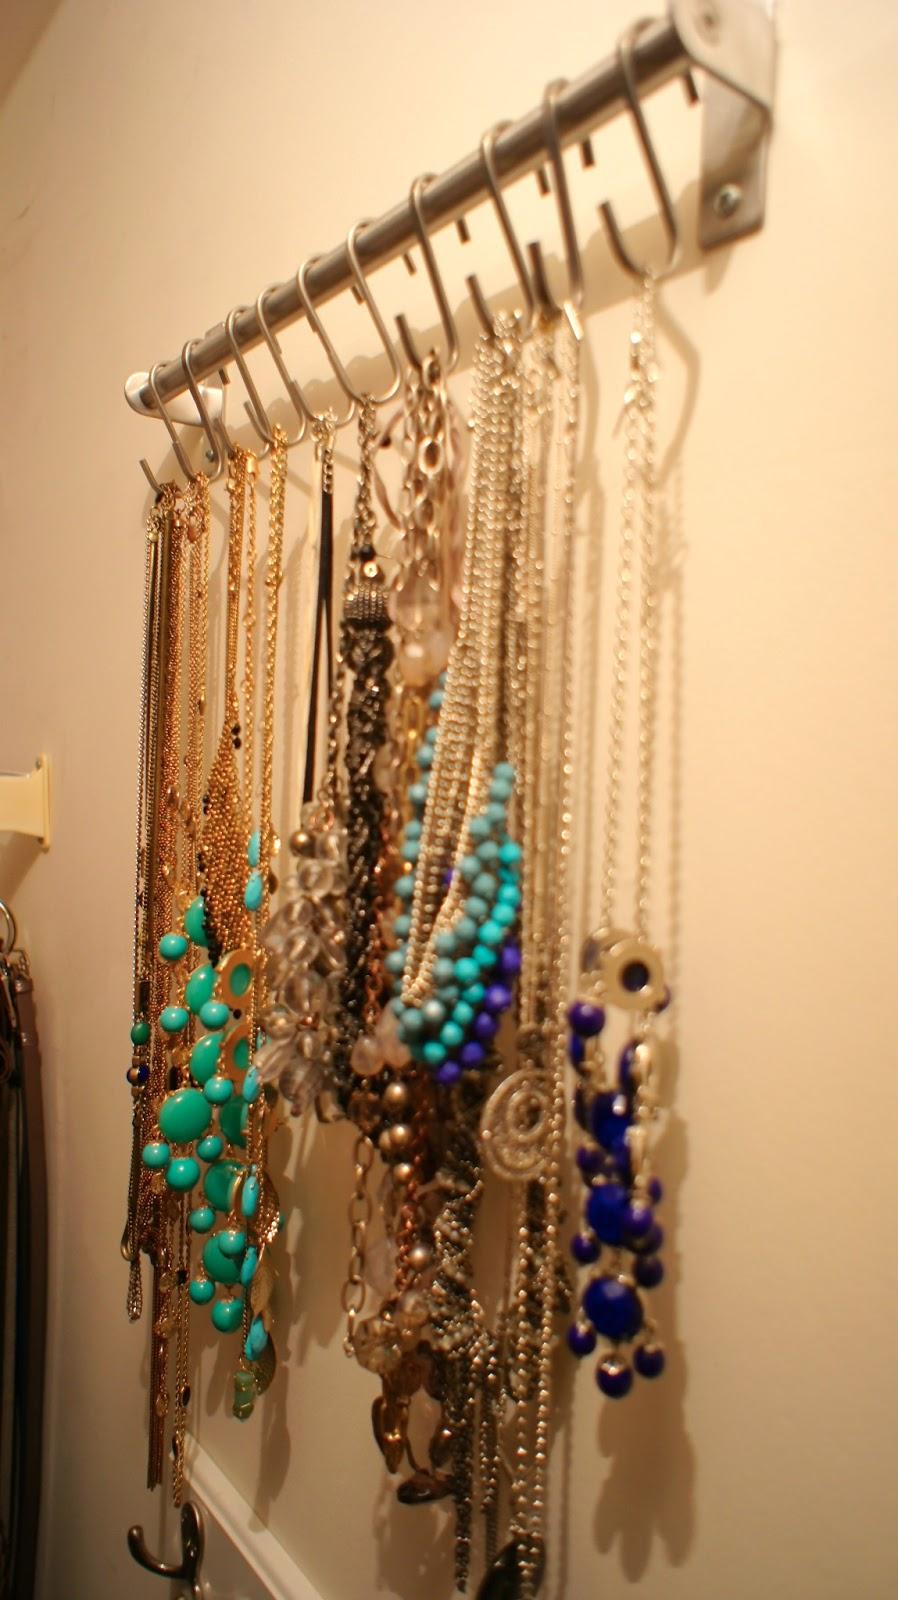 Food. Fashion. Home.: Necklace Organizer System